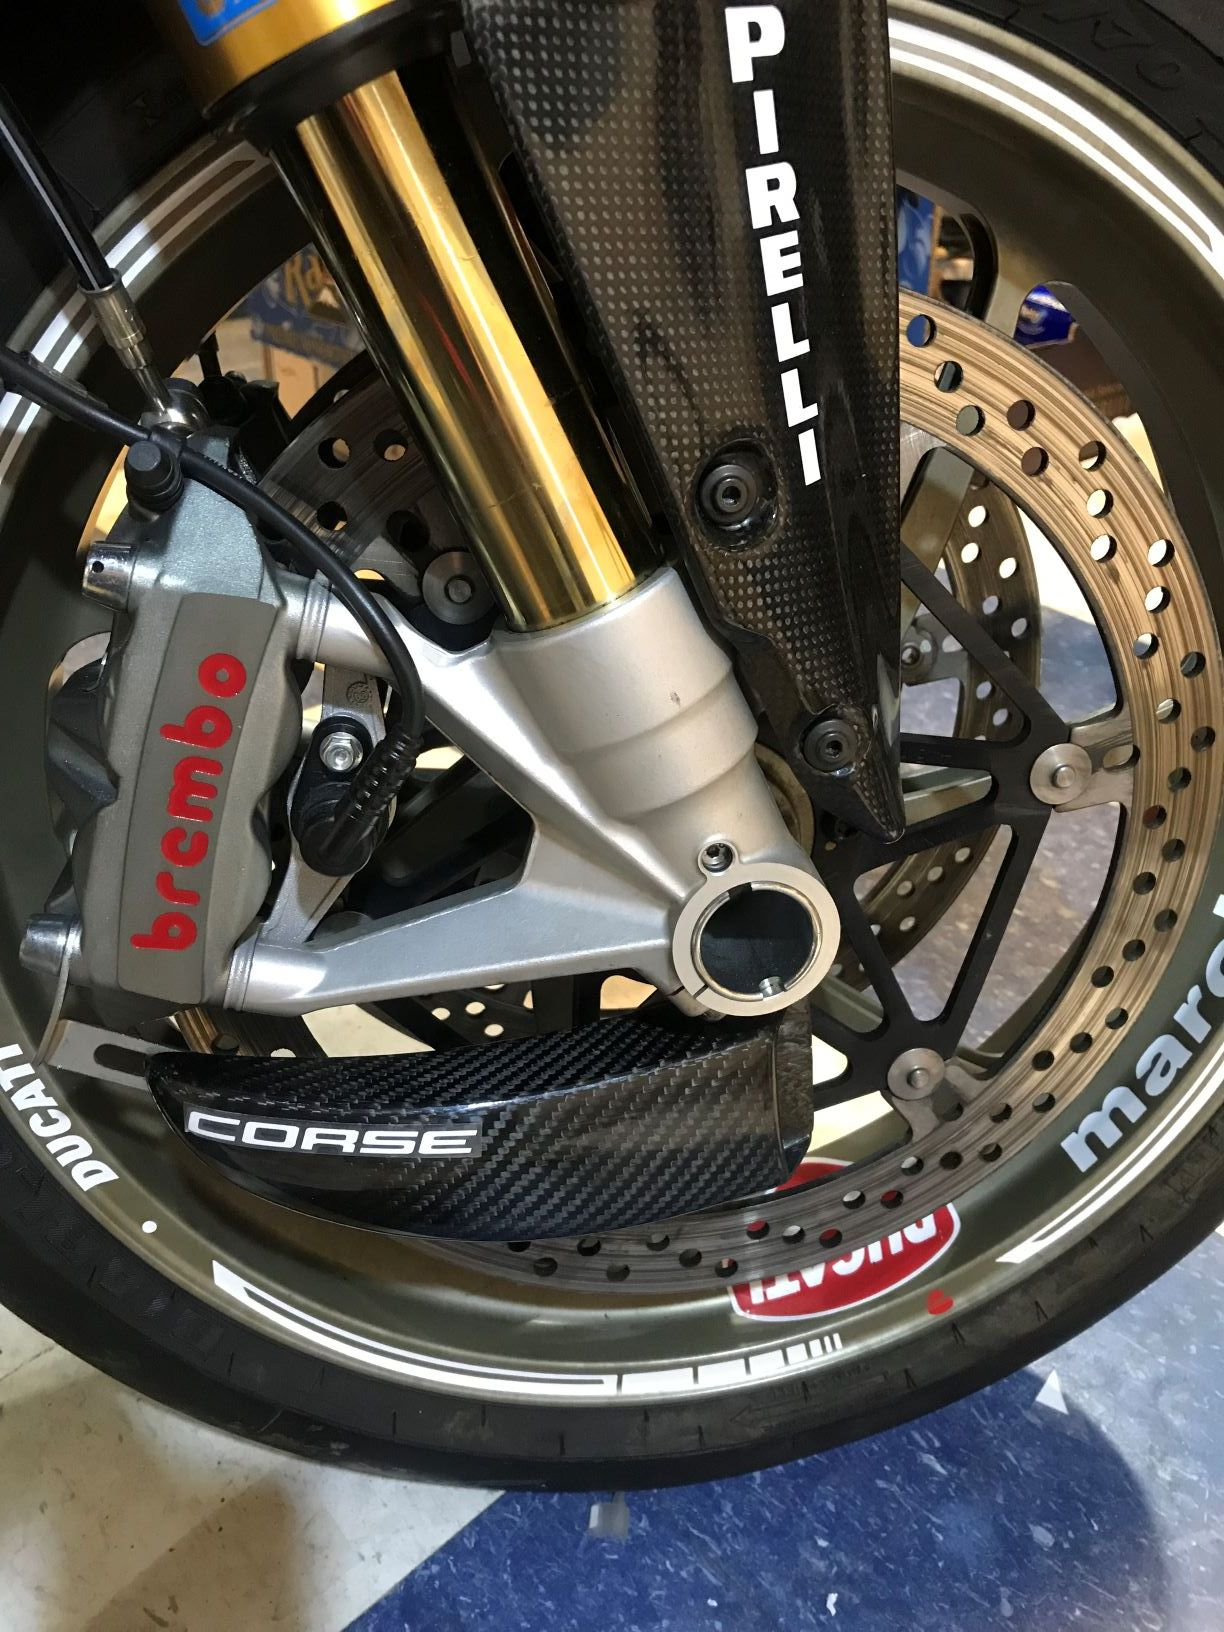 New Carbon Fiber Brake Cooling Ducts On Ducati 1198s In 2020 Ducati Ducati 1198s Ducati 1198